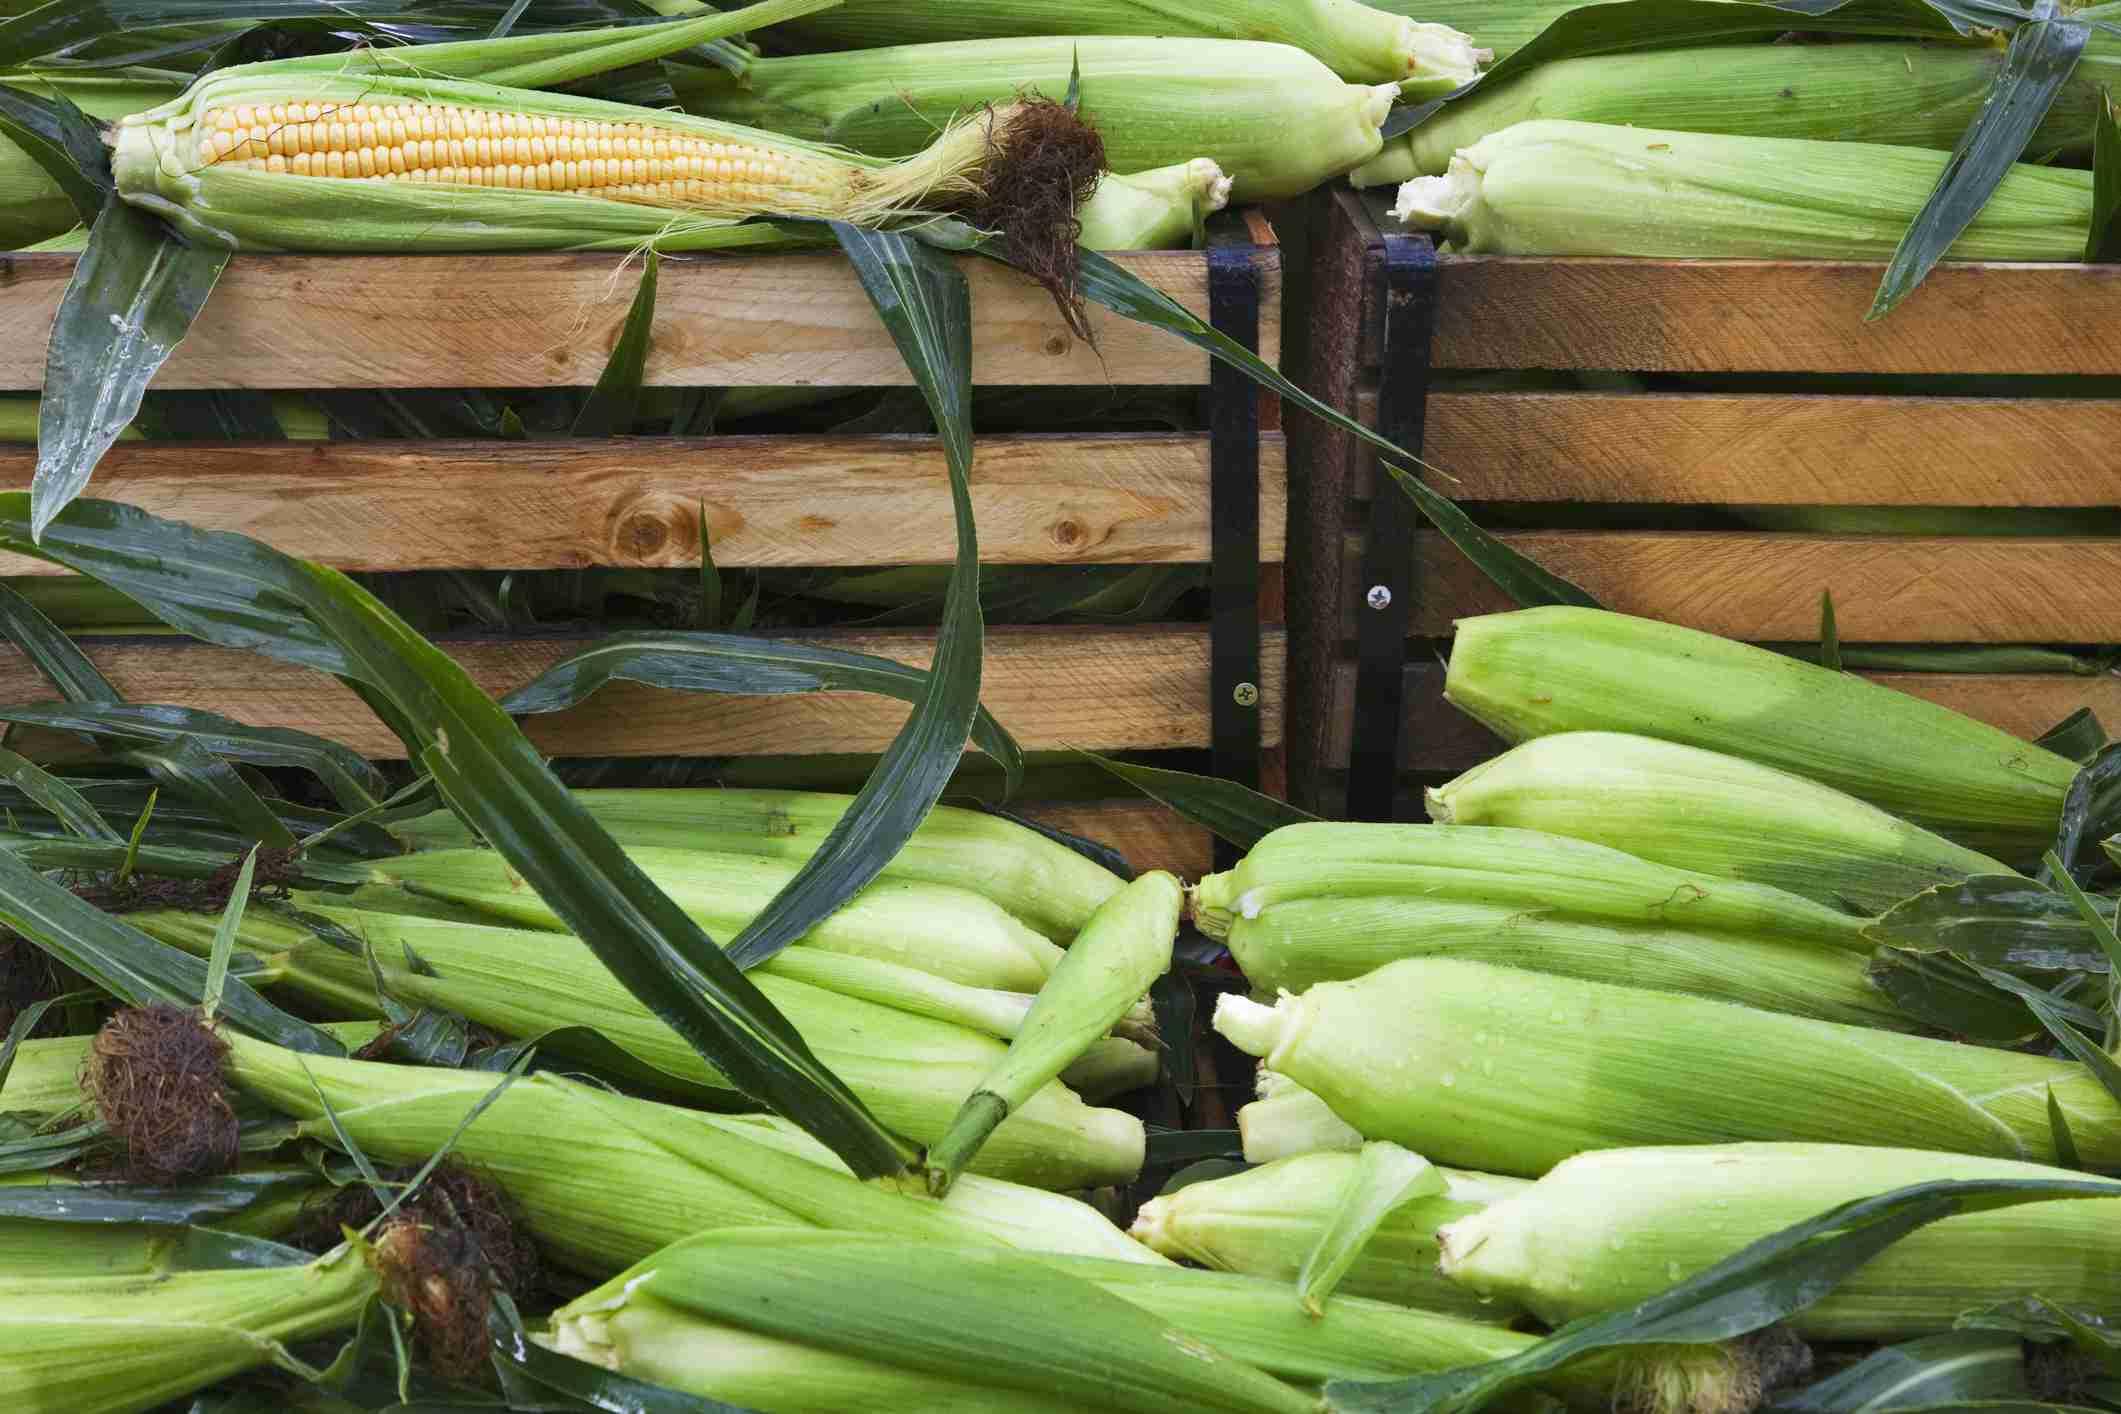 Corn at a Montana Market